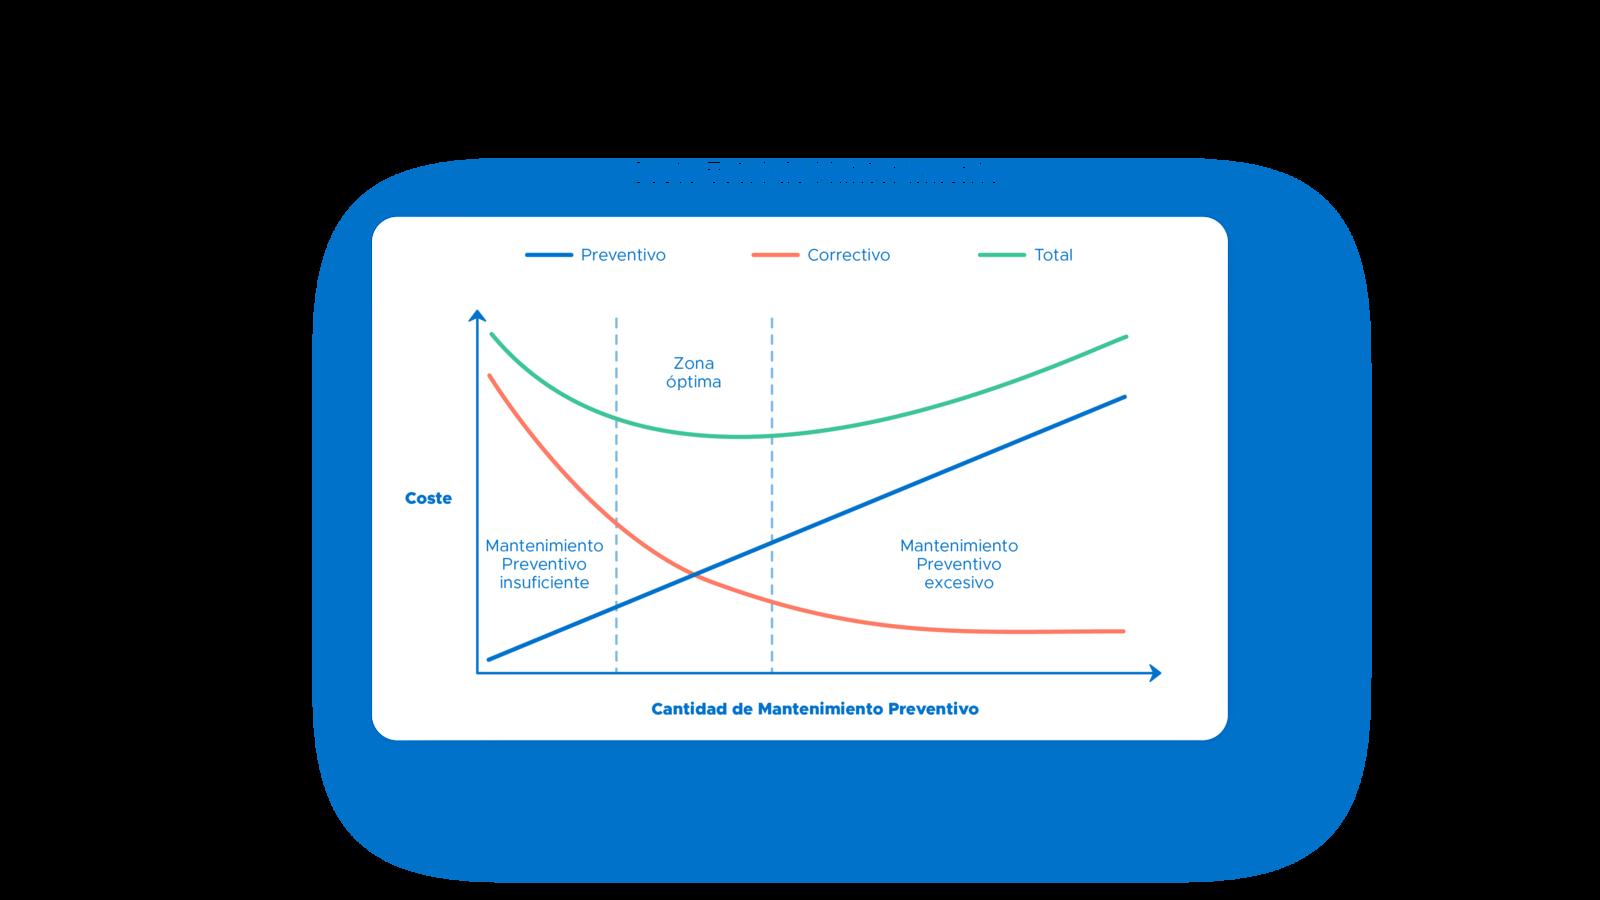 Costes del mantenimiento preventivo excesivo